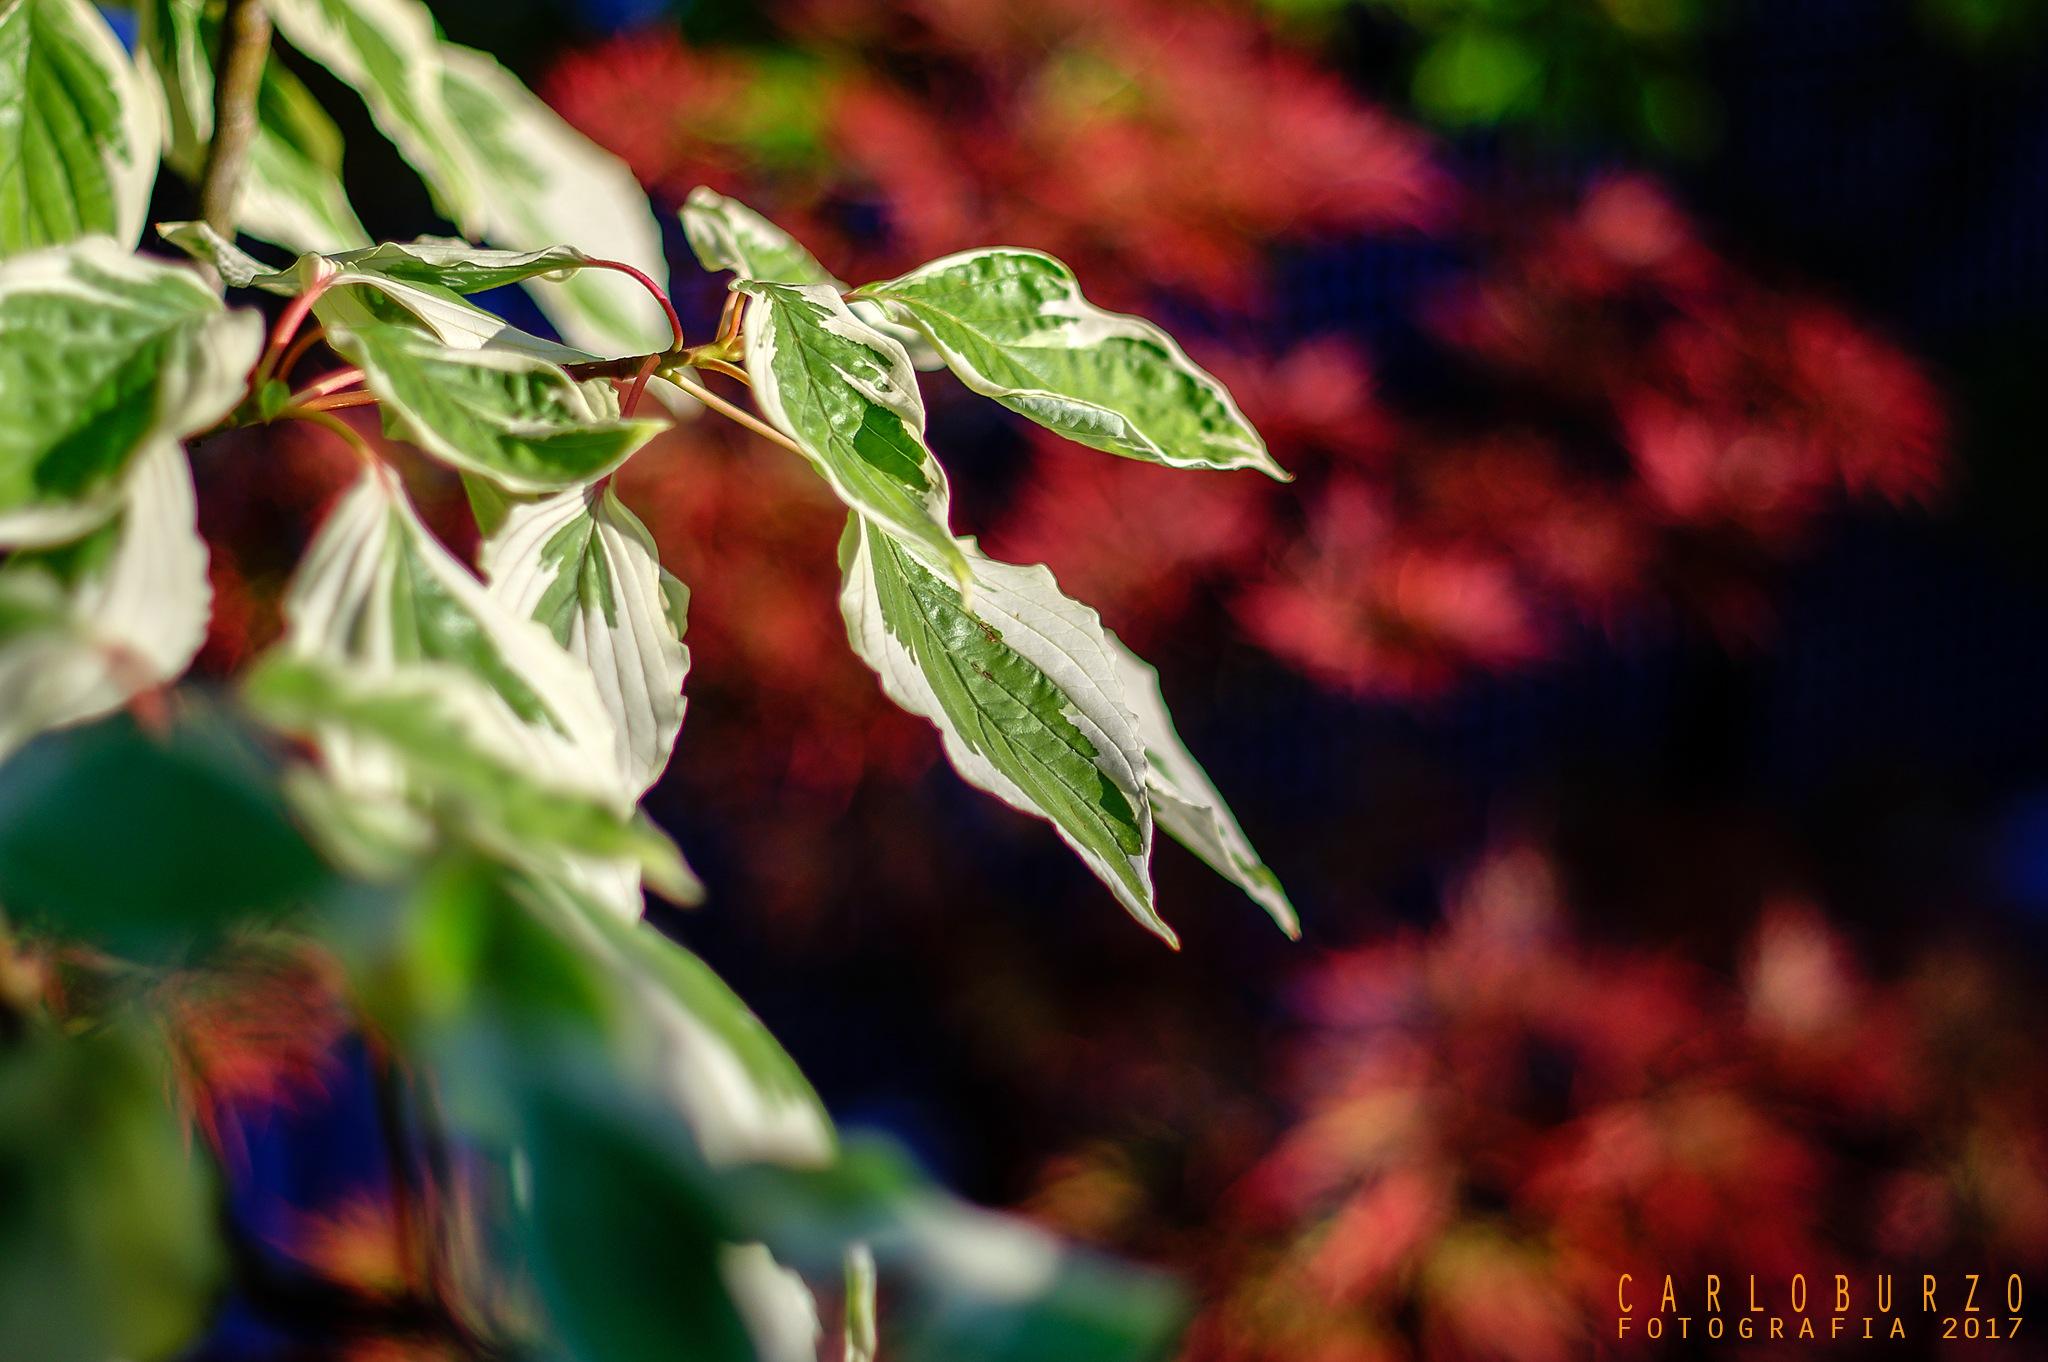 Autumn in my garden by Carlo Burzo